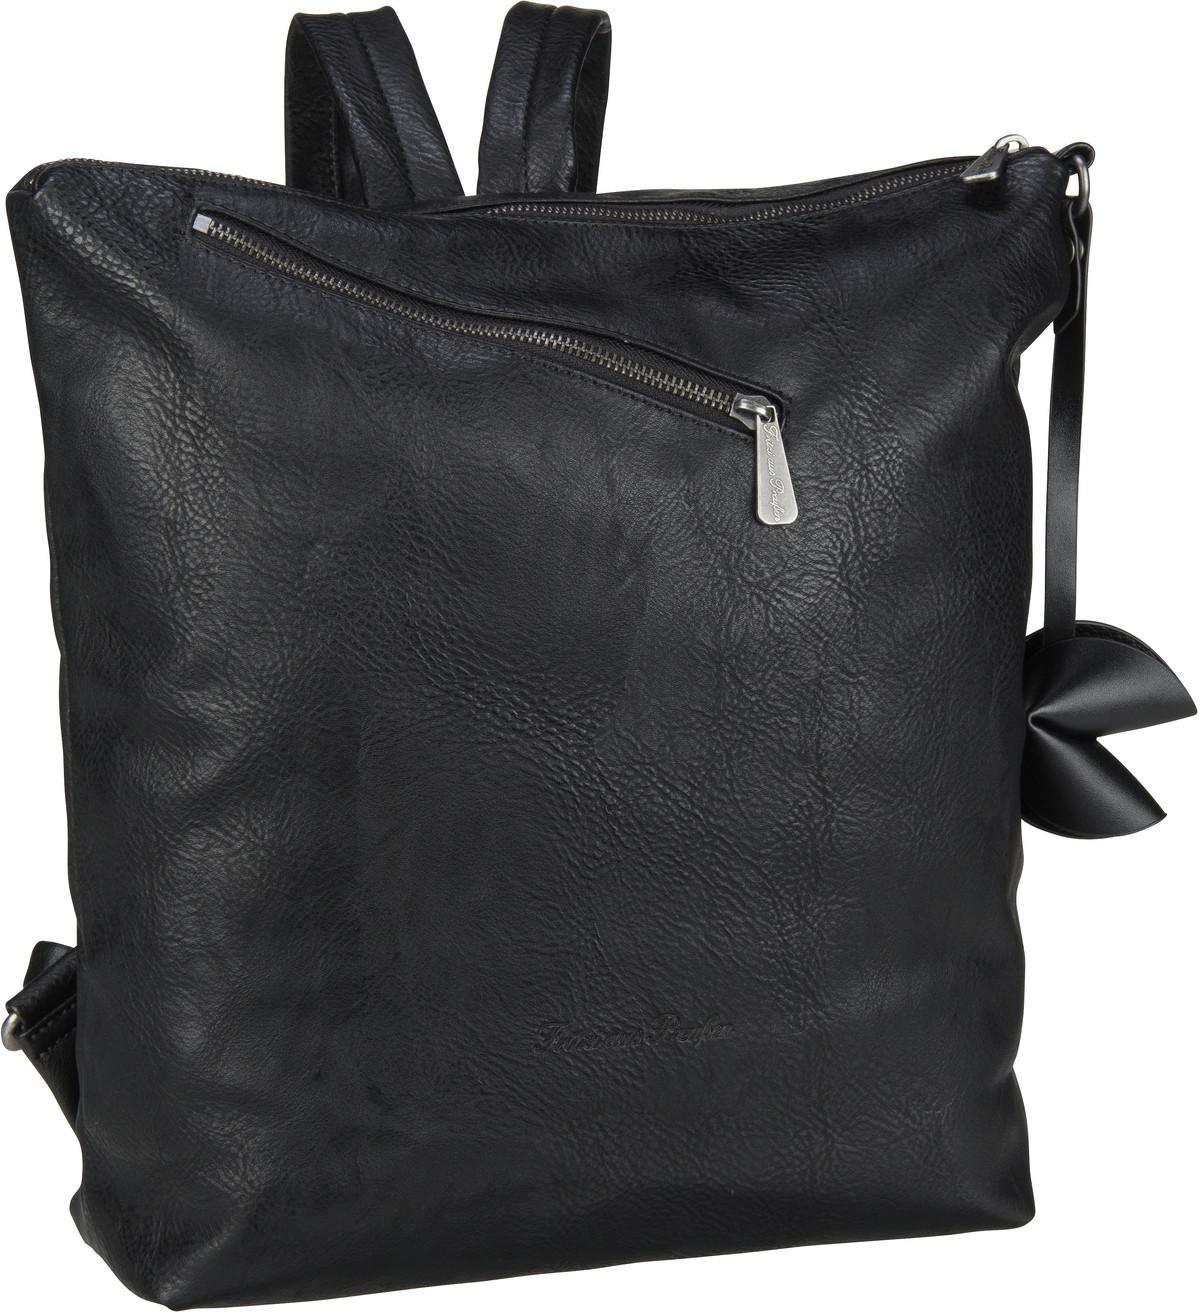 Rucksack / Daypack Andy Saddle Black